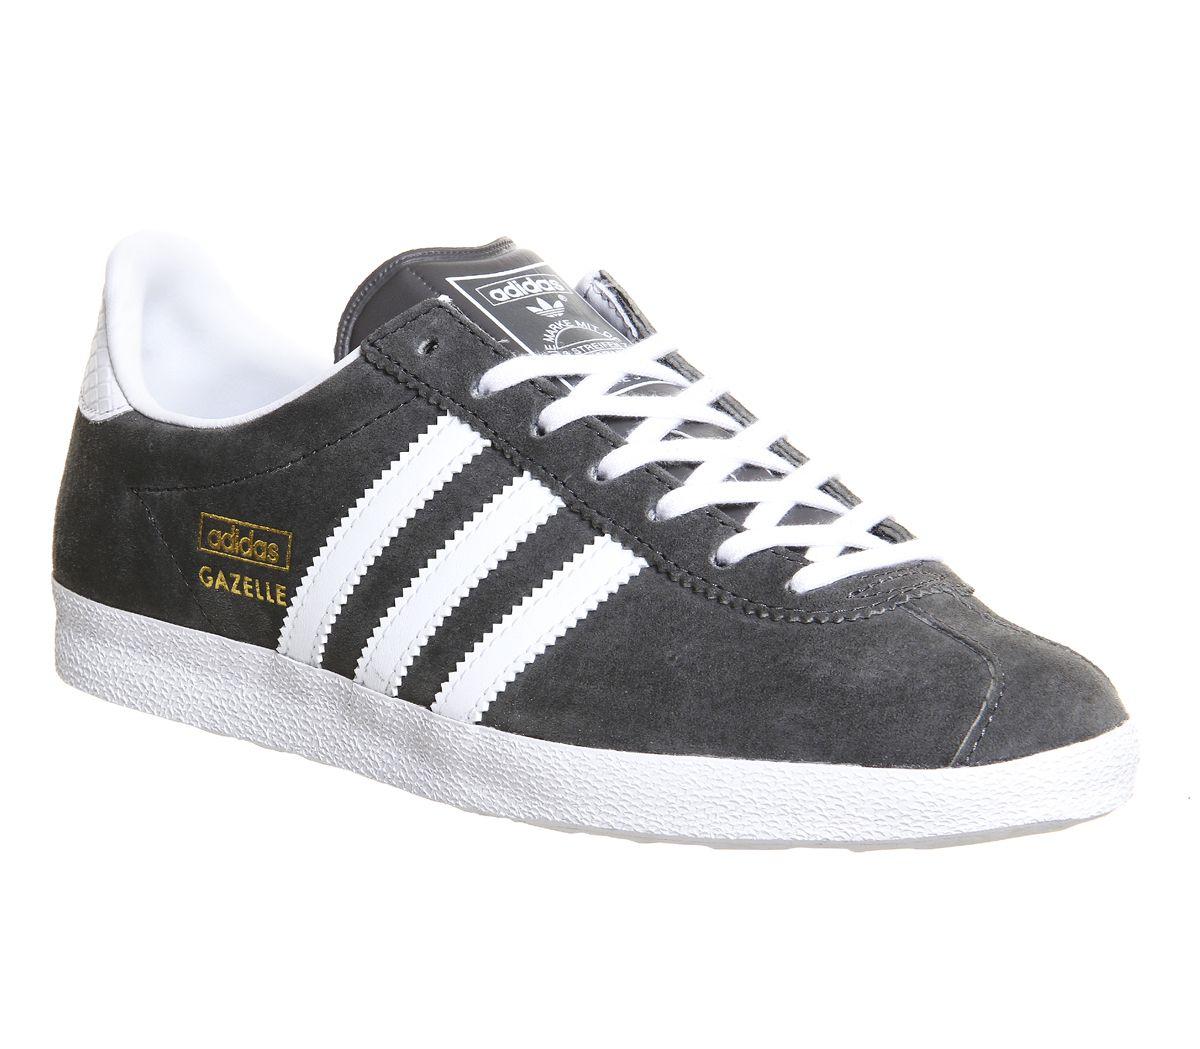 adidas gazelle black white og